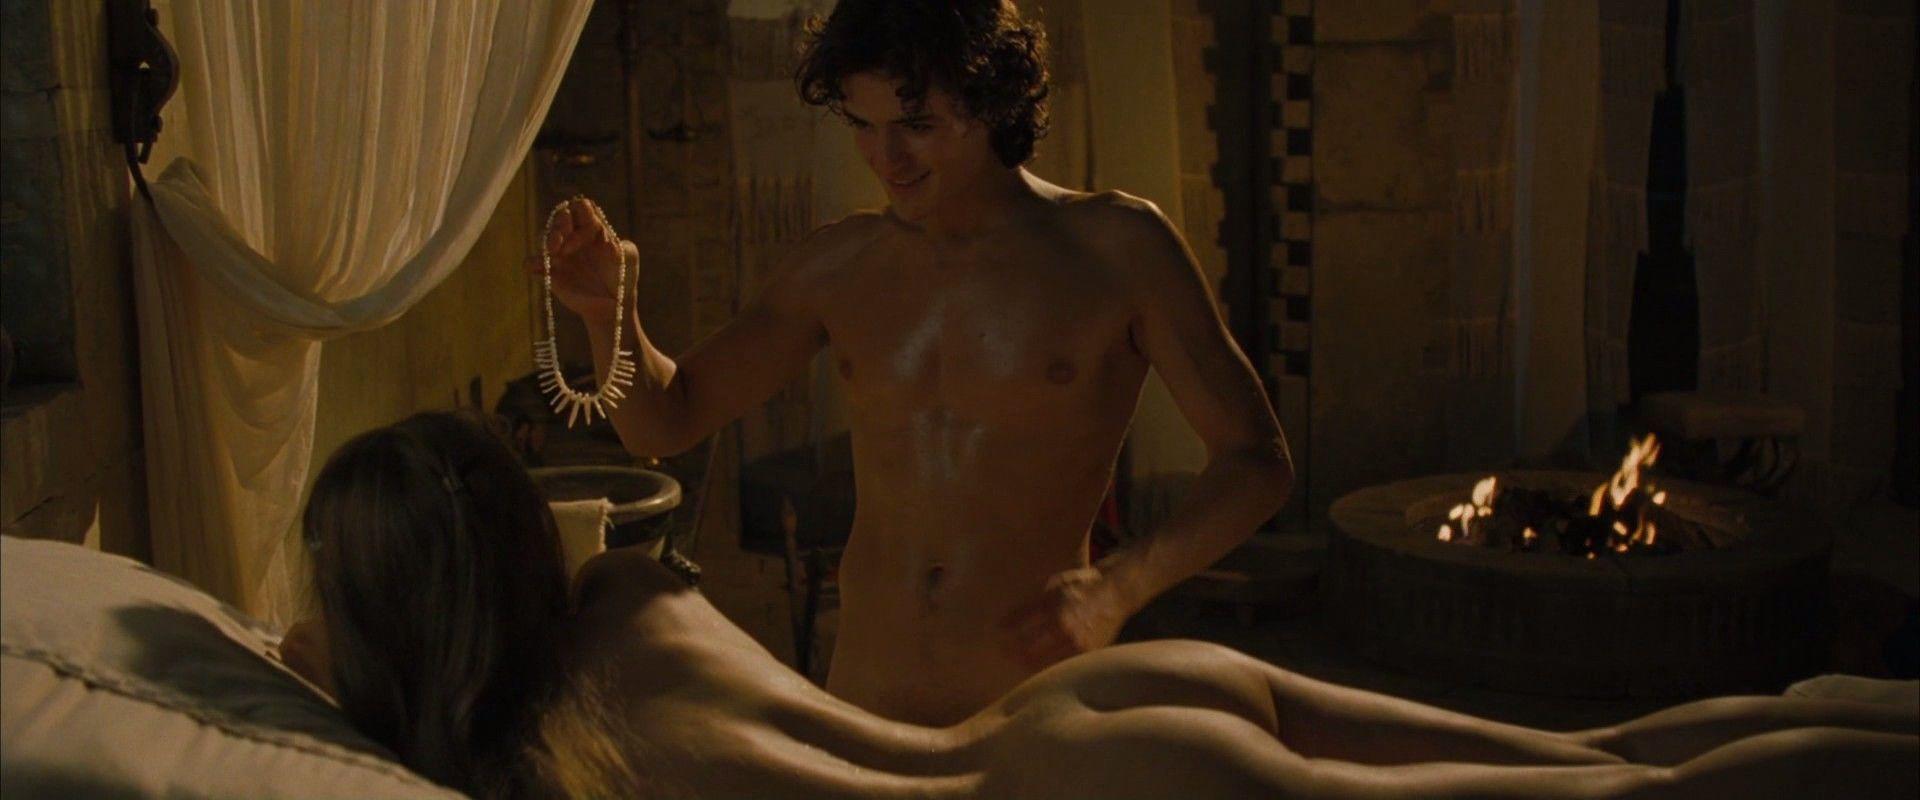 Pornthe hotest scene